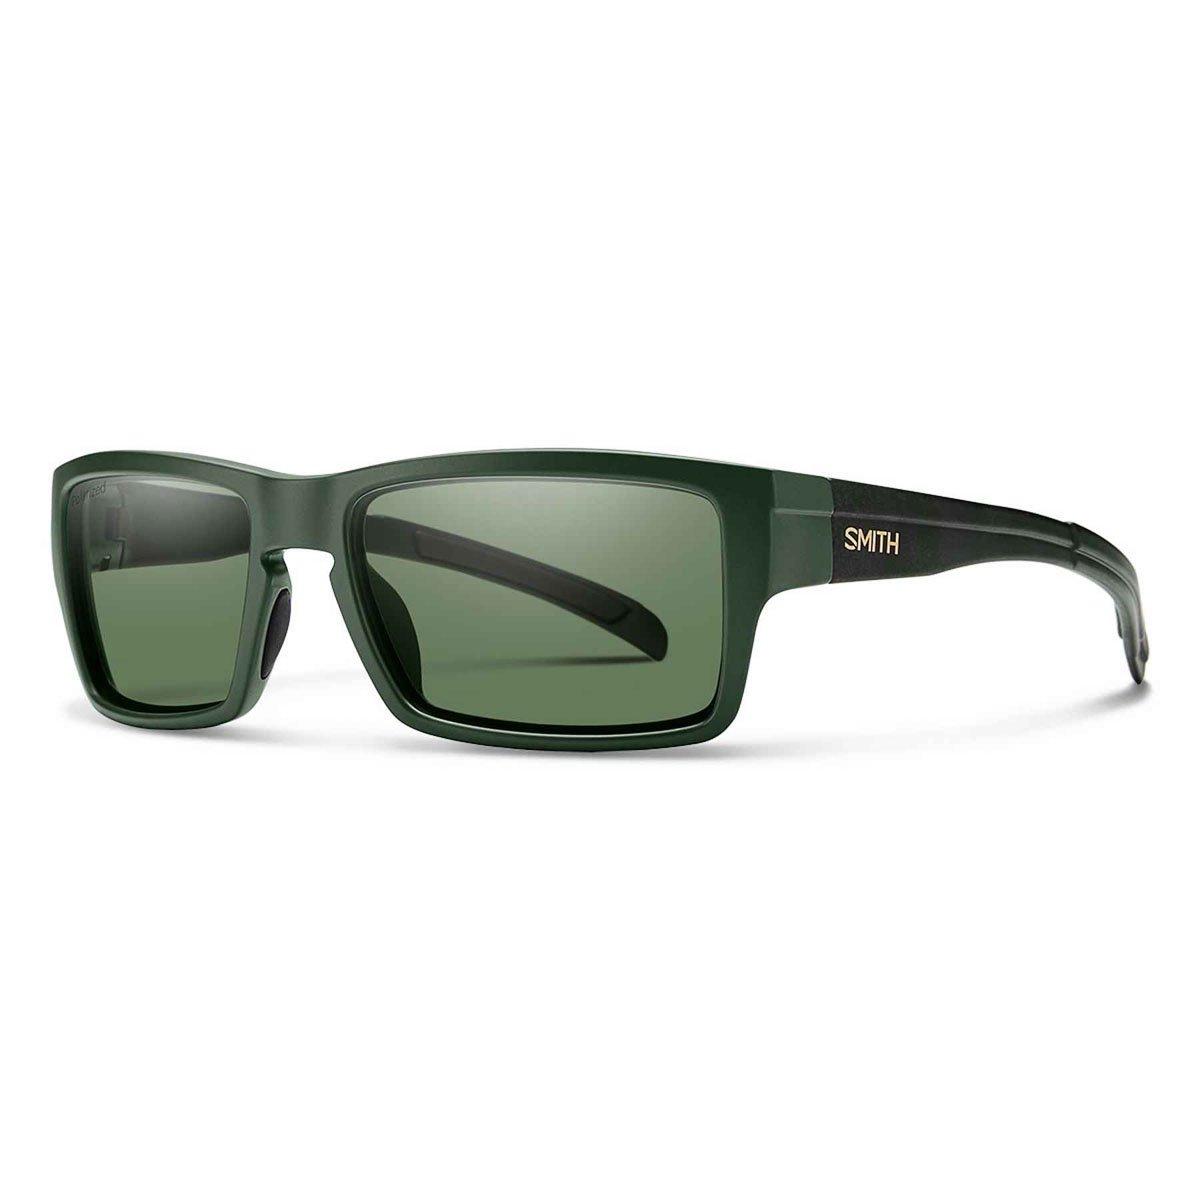 b9ec4b55fa0 Amazon.com  Smith Outlier Carbonic Polarized Sunglasses  Sports   Outdoors